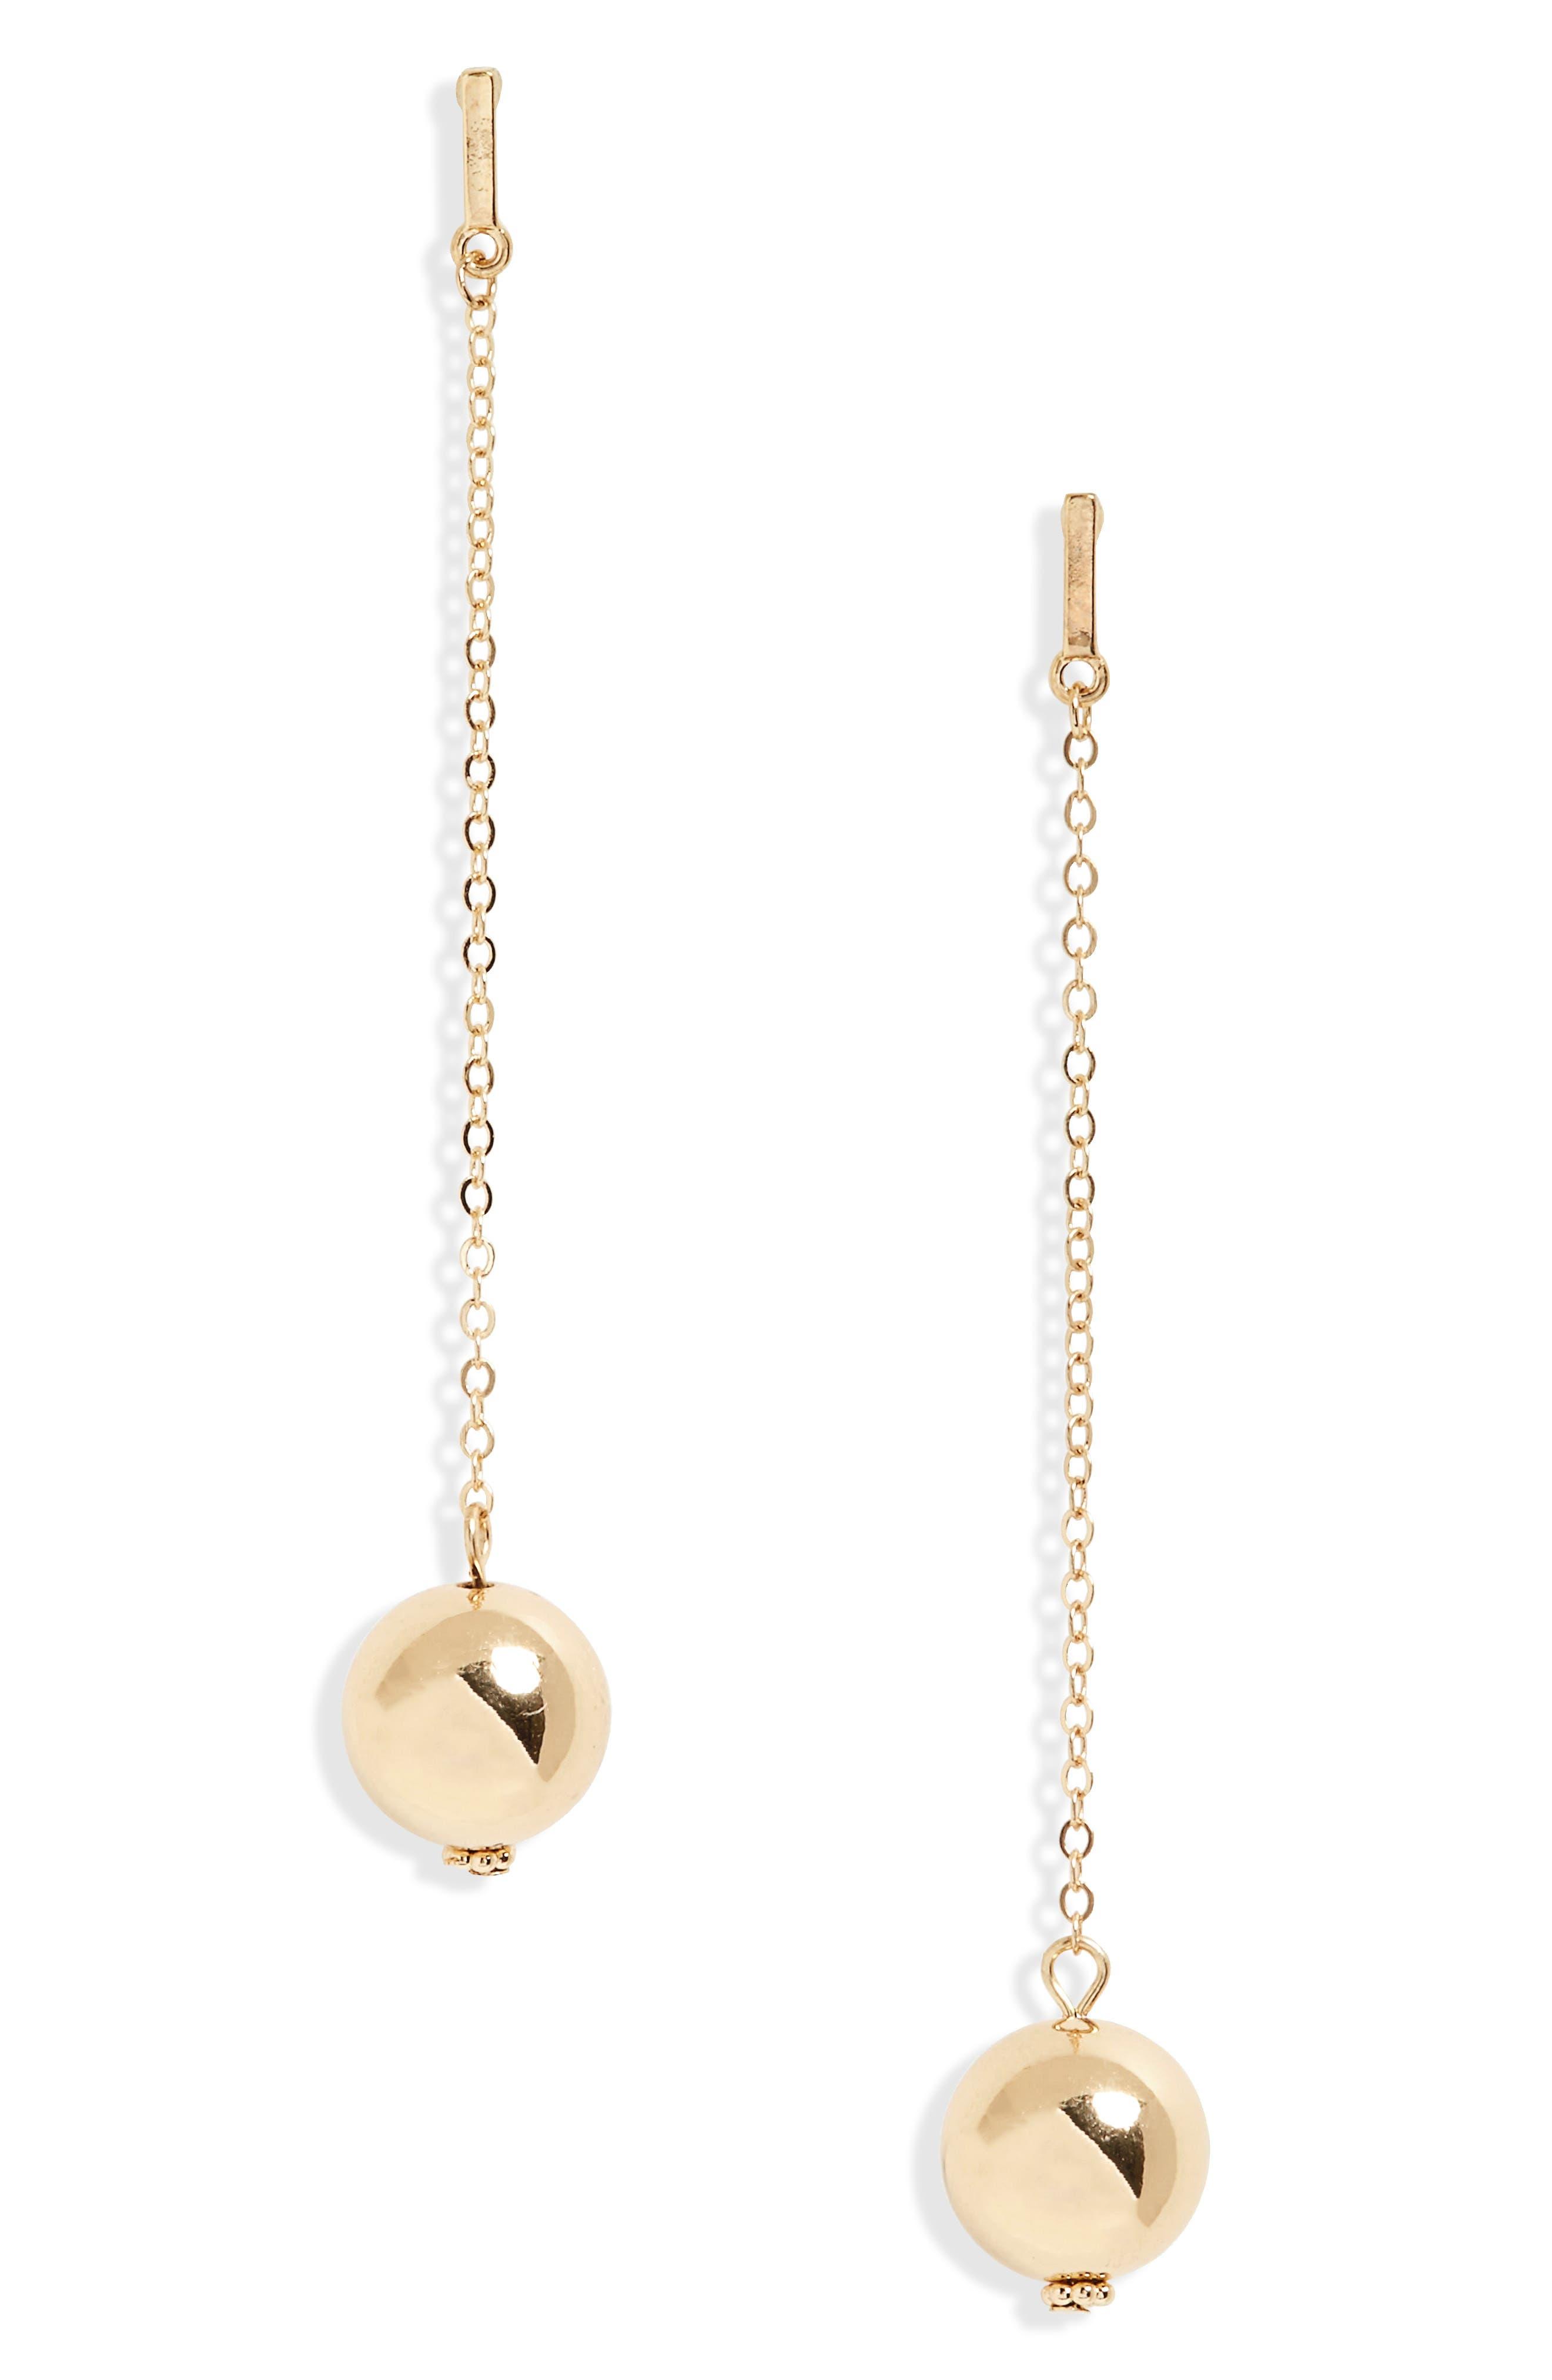 Chain & Ball Drop Earrings,                             Main thumbnail 1, color,                             710